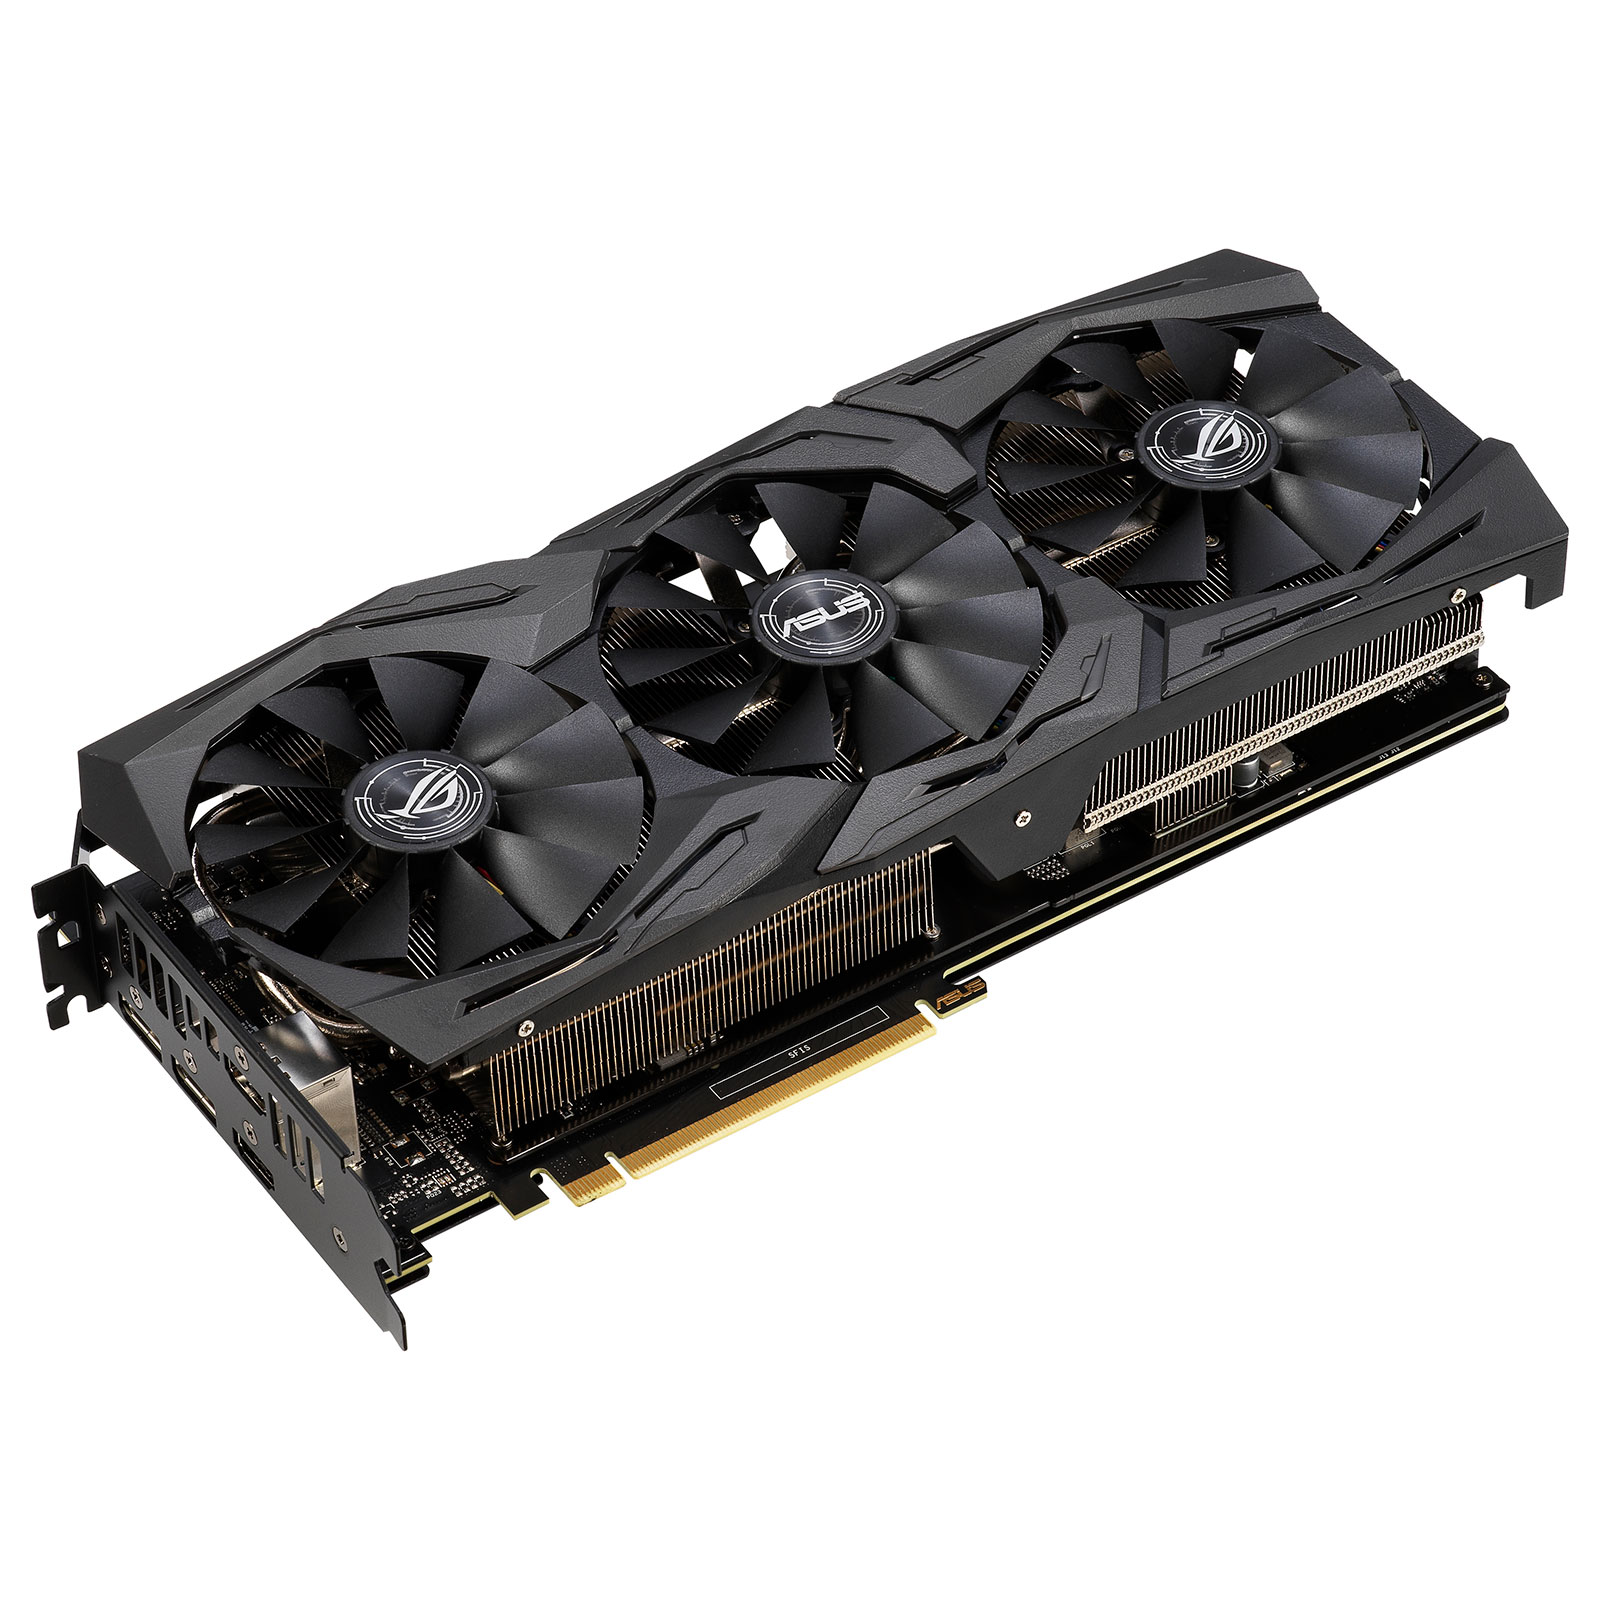 ROG Strix GeForce RTX 2060 OC Edition 6GB GDDR6 (90YV0CI0-M0NA00) - Achat / Vente Carte graphique sur Picata.fr - 3